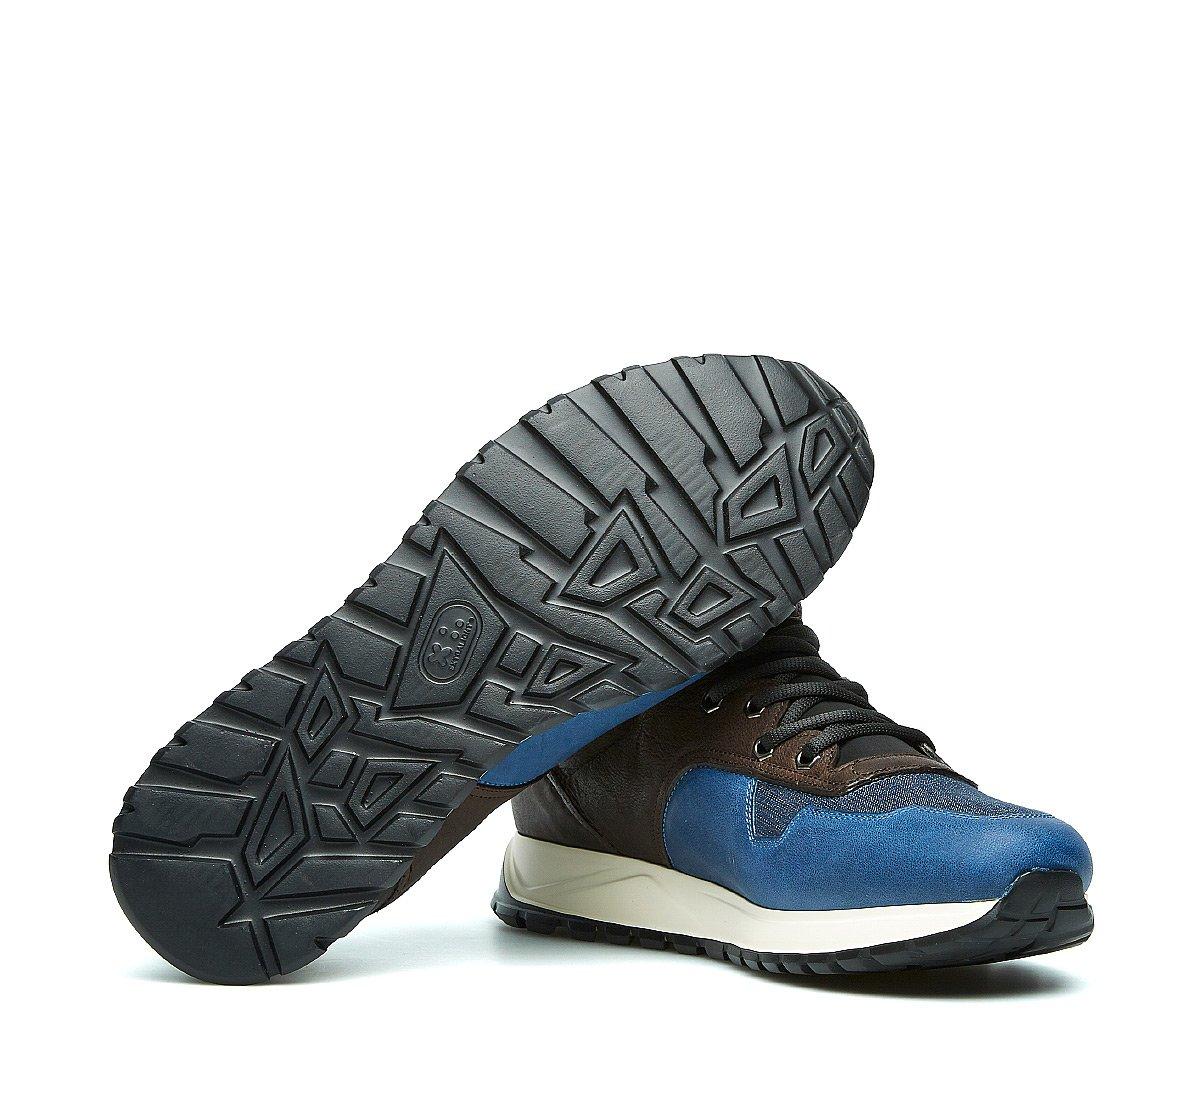 Barracuda sneaker in calfskin and fabric